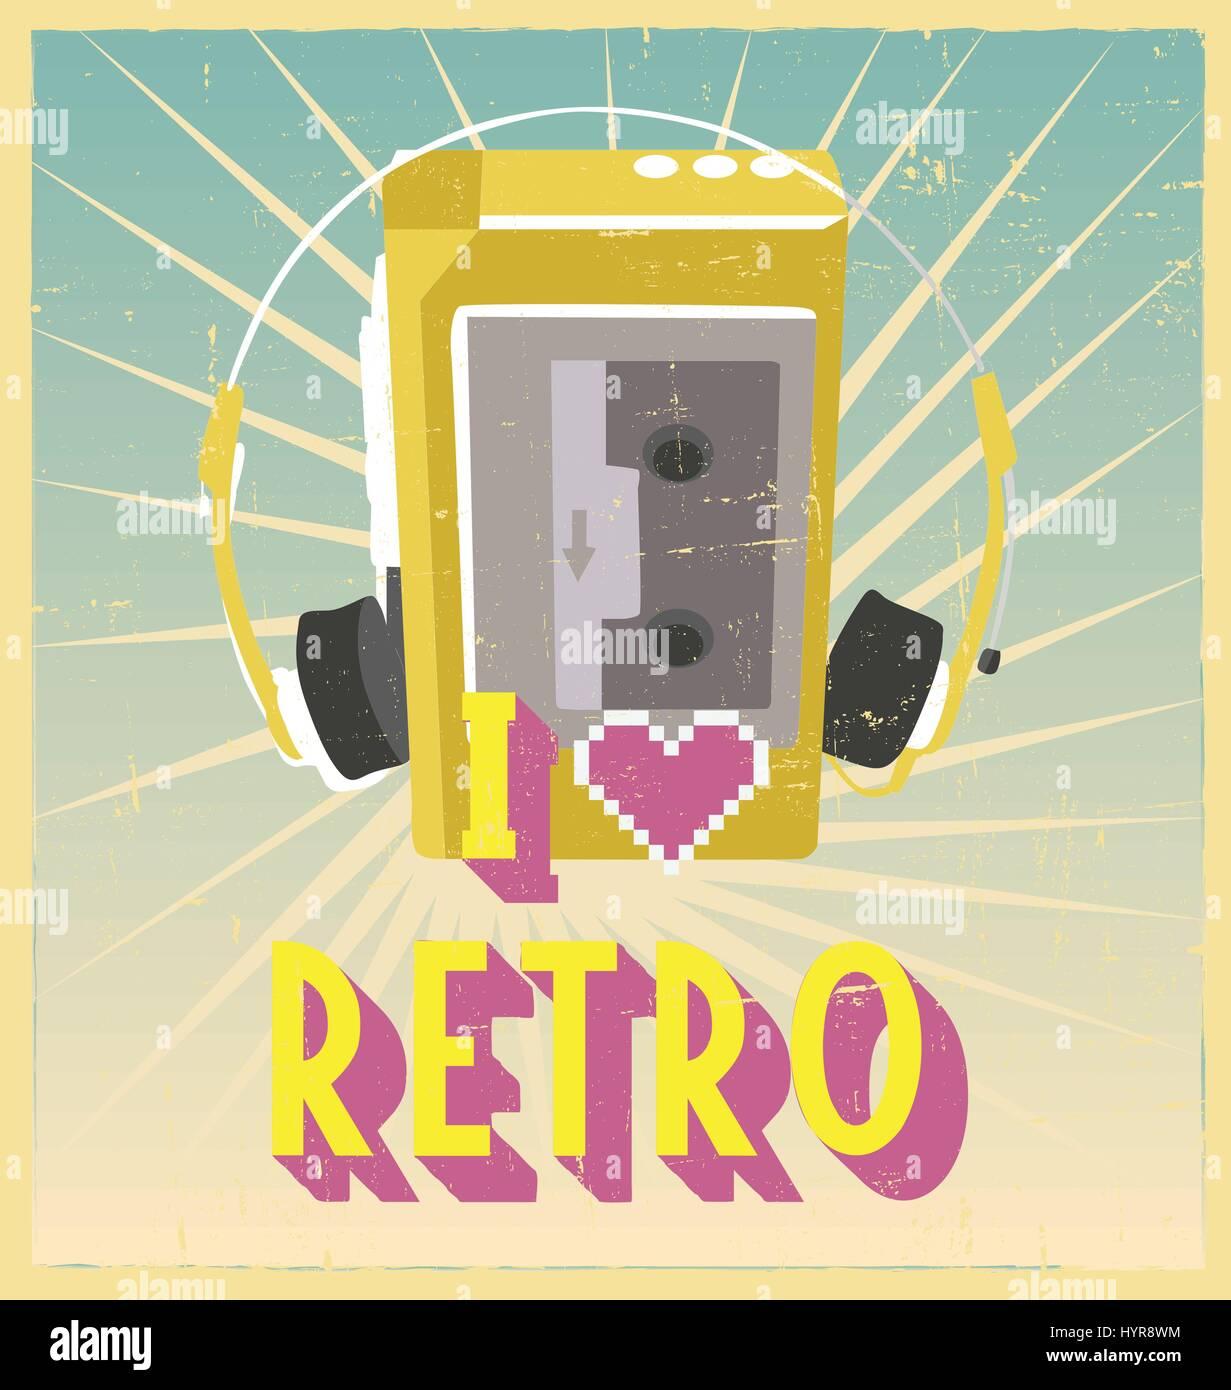 i love retro sign with walkman on postcard or poster. retro vintage poster or postcard design with walkman - Stock Vector